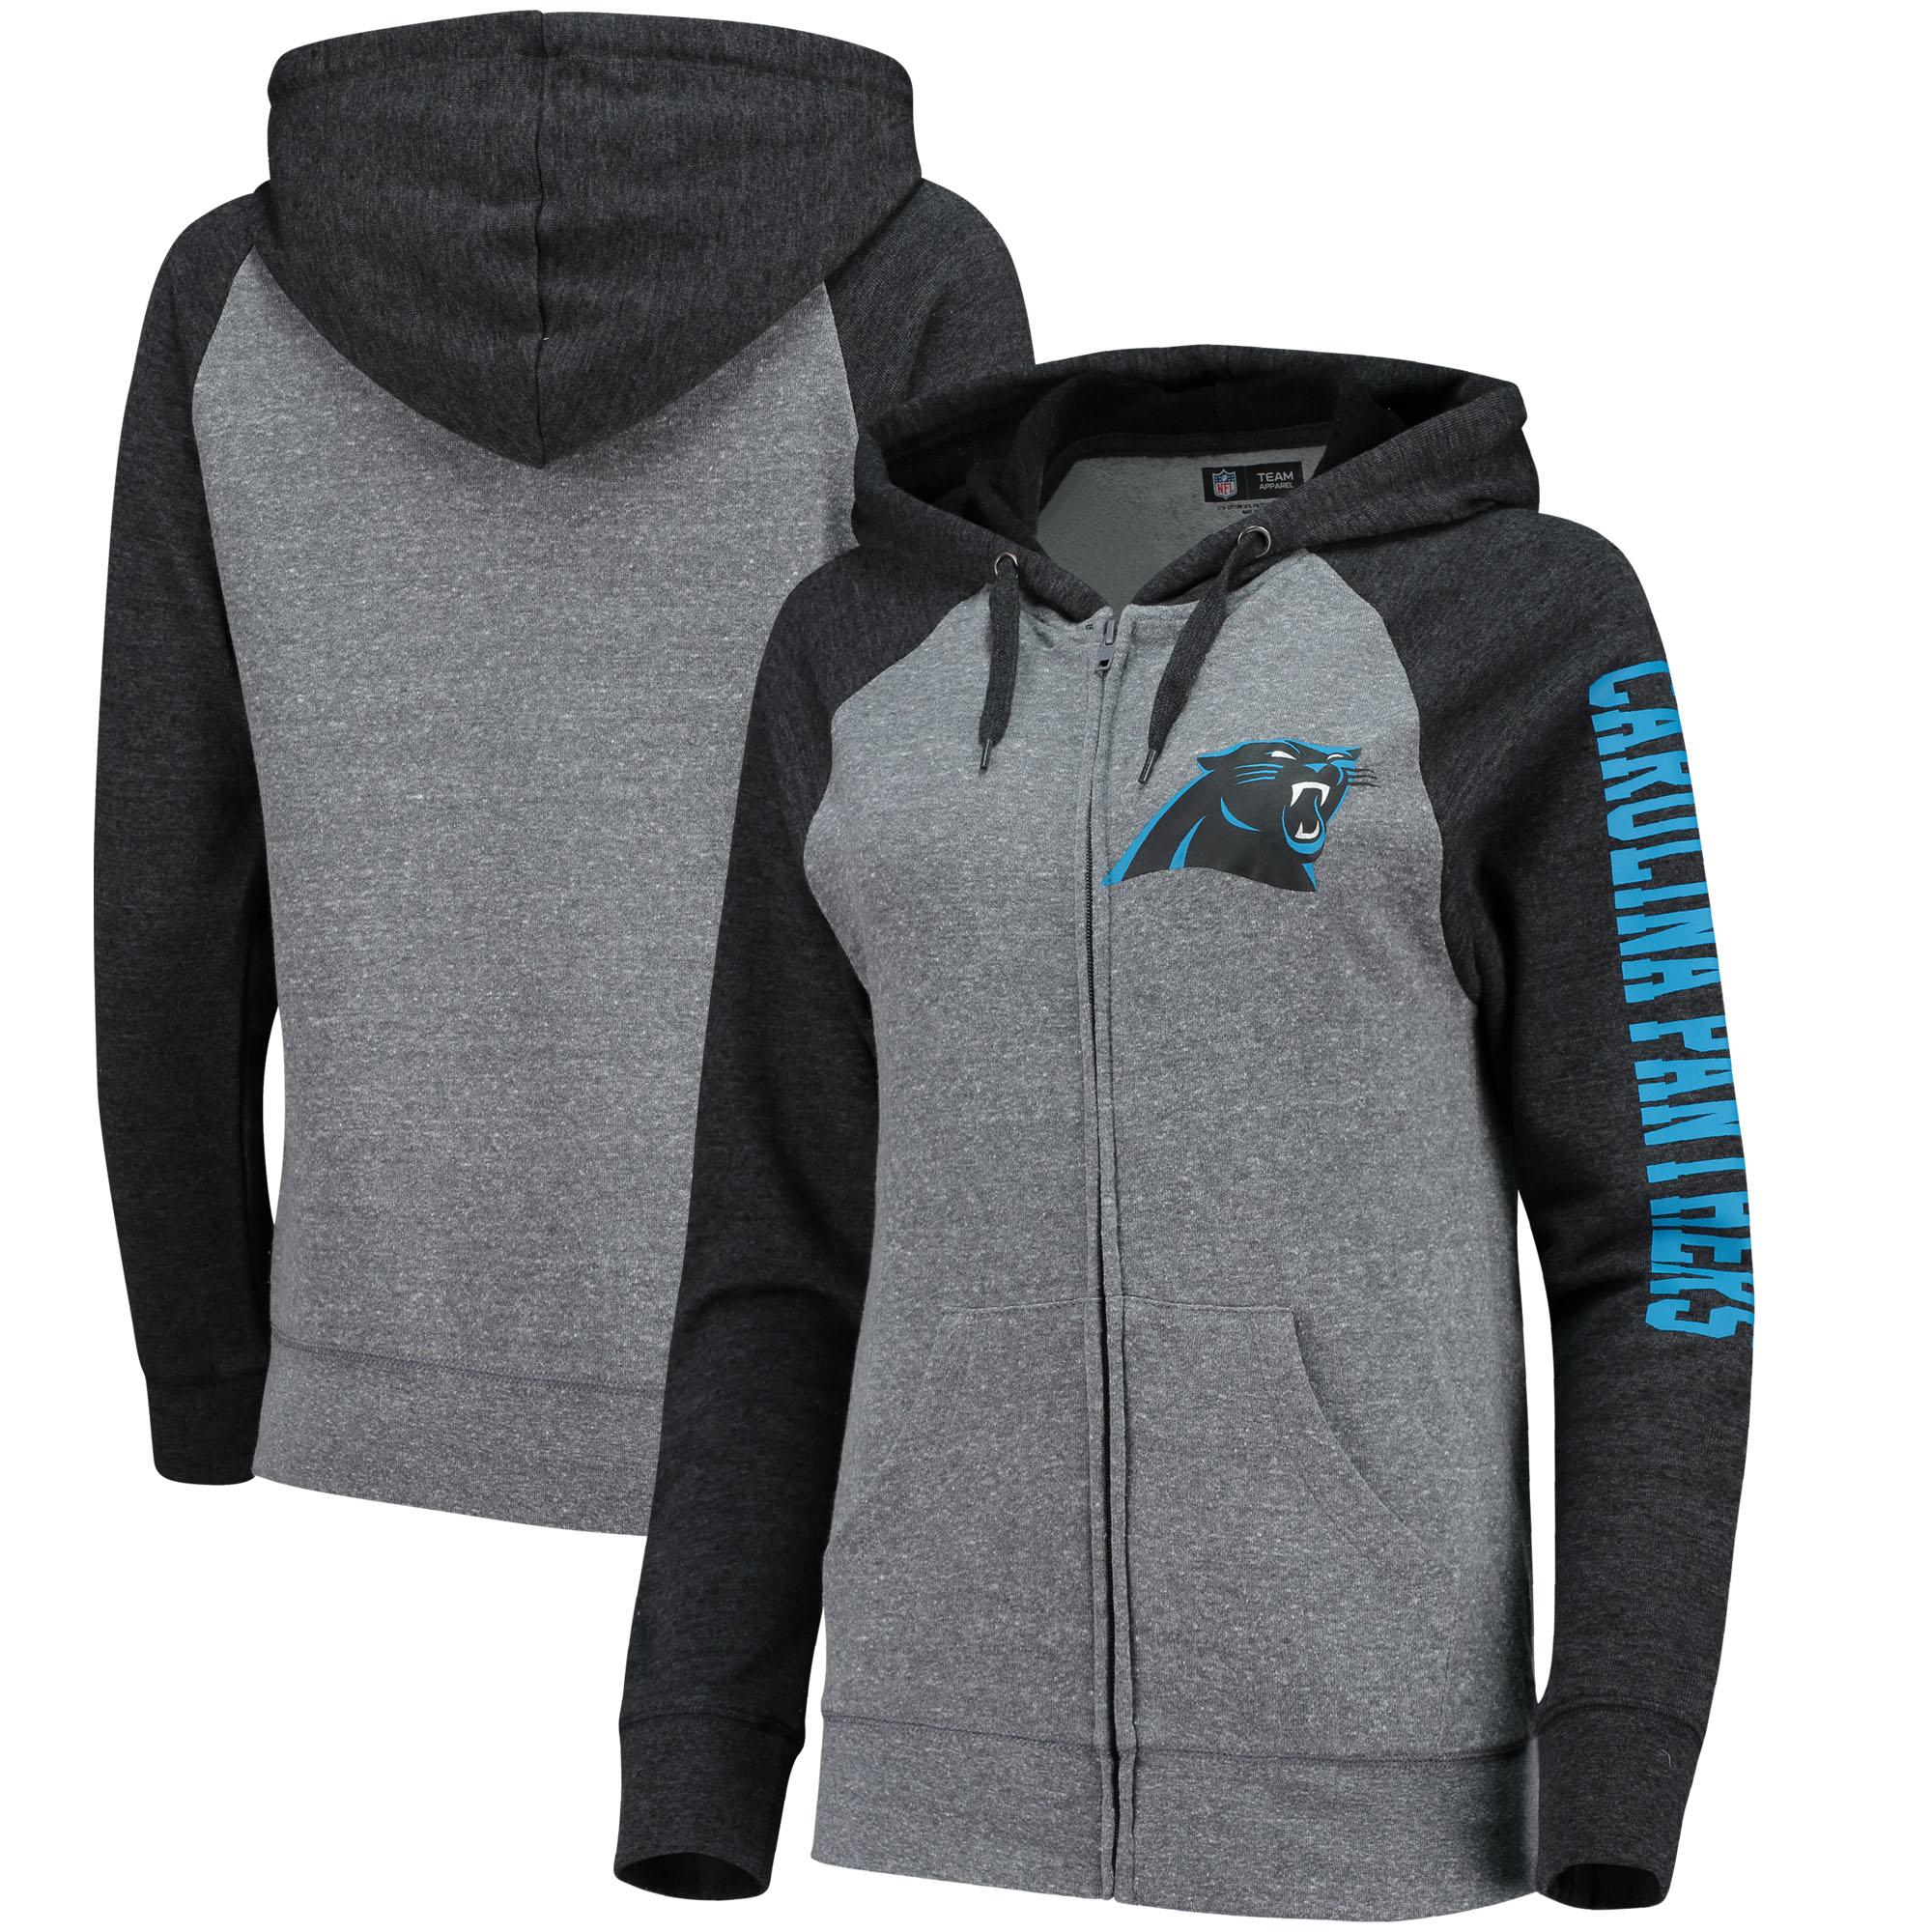 Carolina Panthers 5th & Ocean by New Era Women's Fleece Tri-Blend Raglan Sleeve Full-Zip Hoodie - Heathered Gray/Black